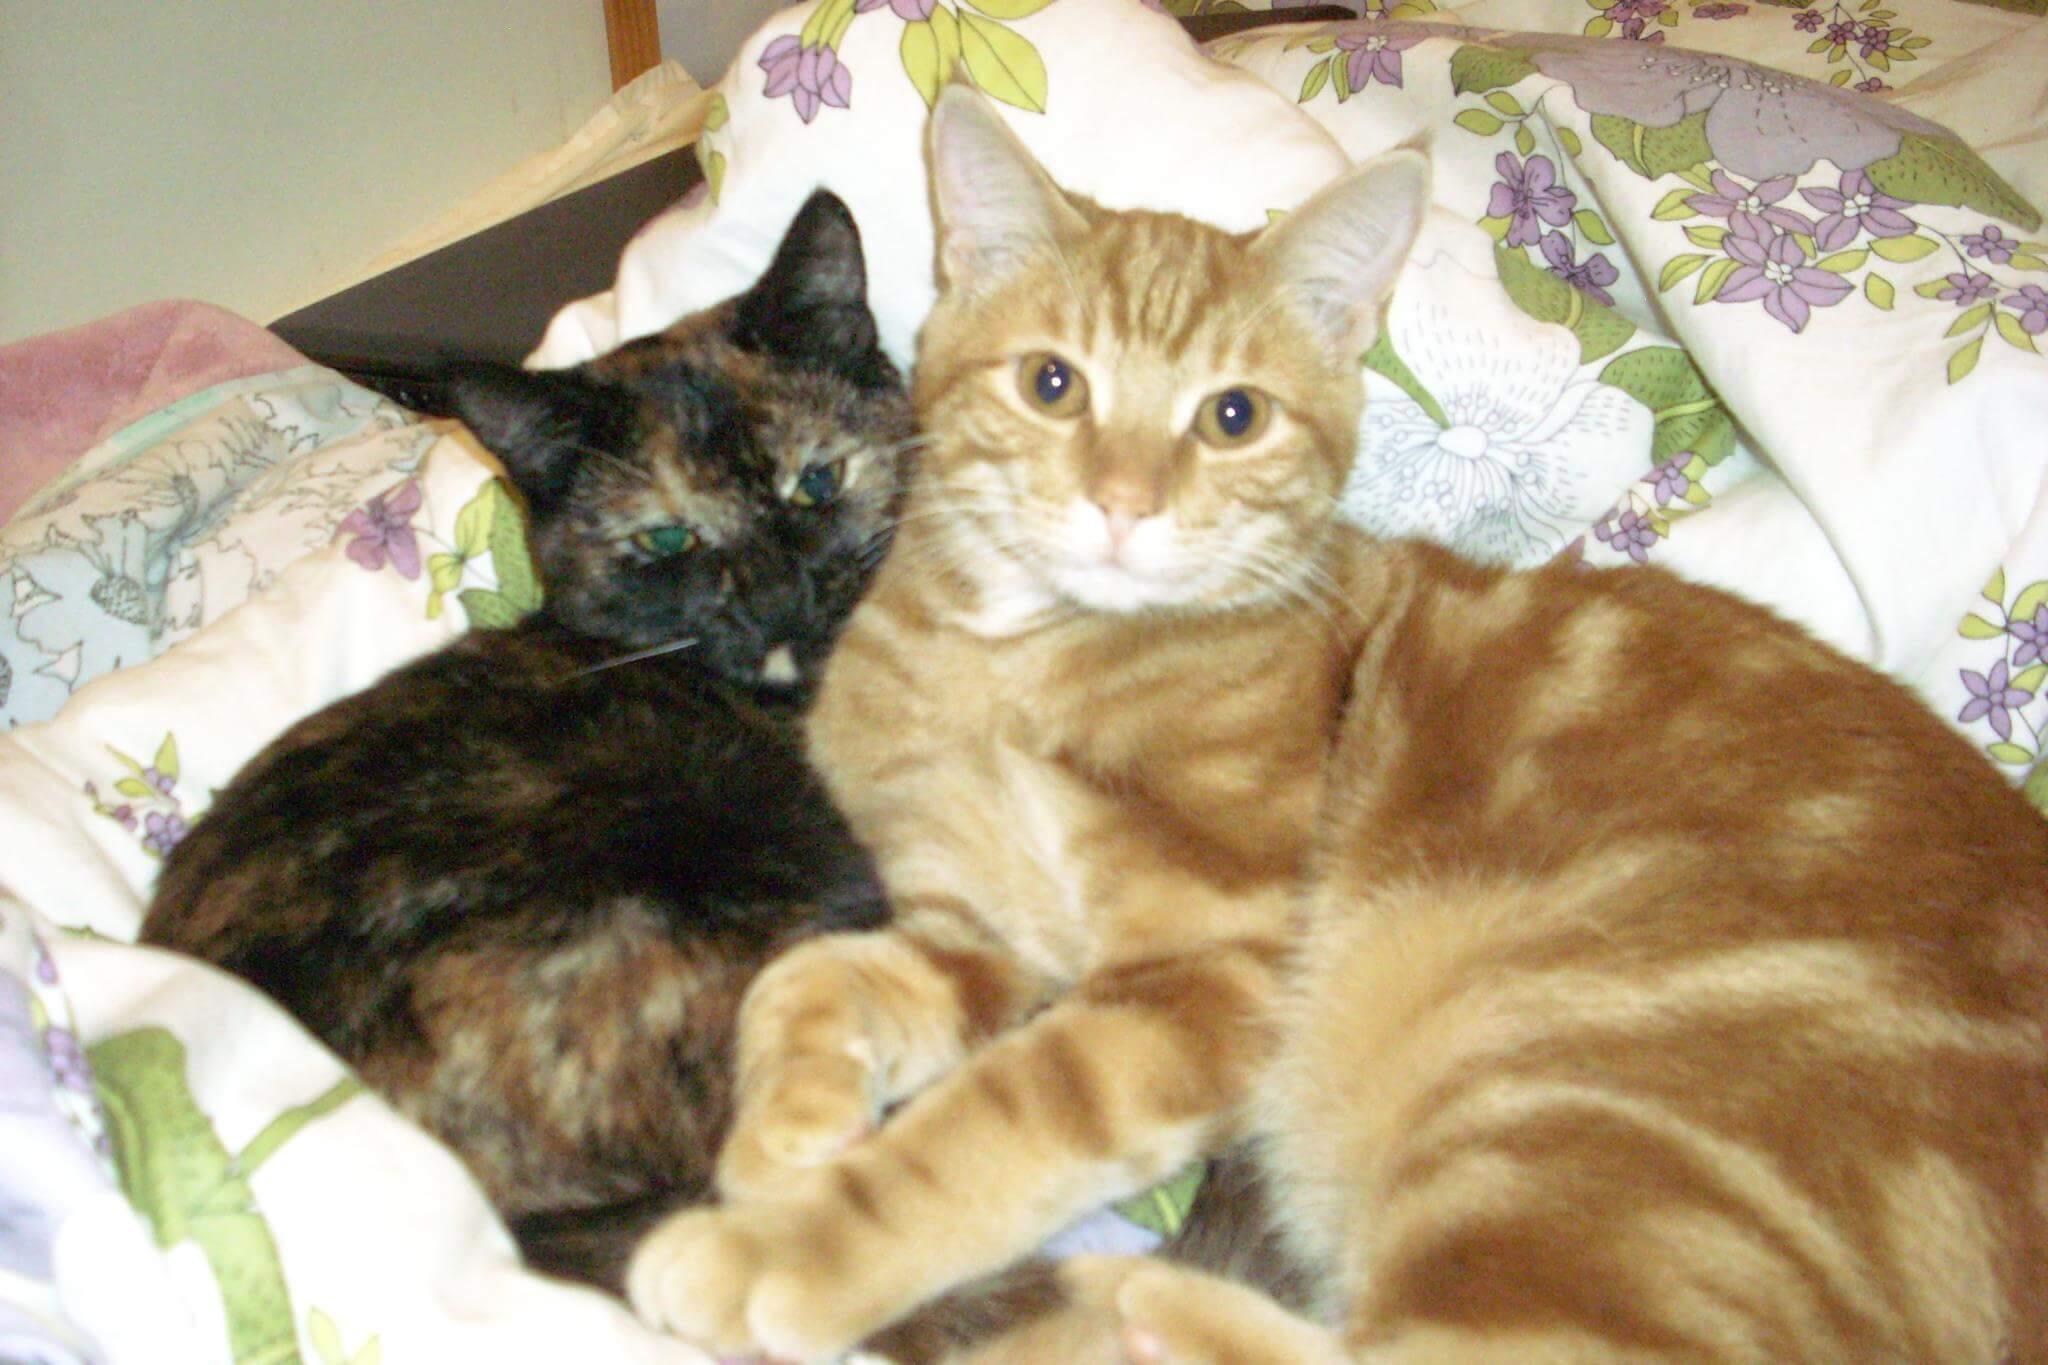 cat in heat - two cats cuddling